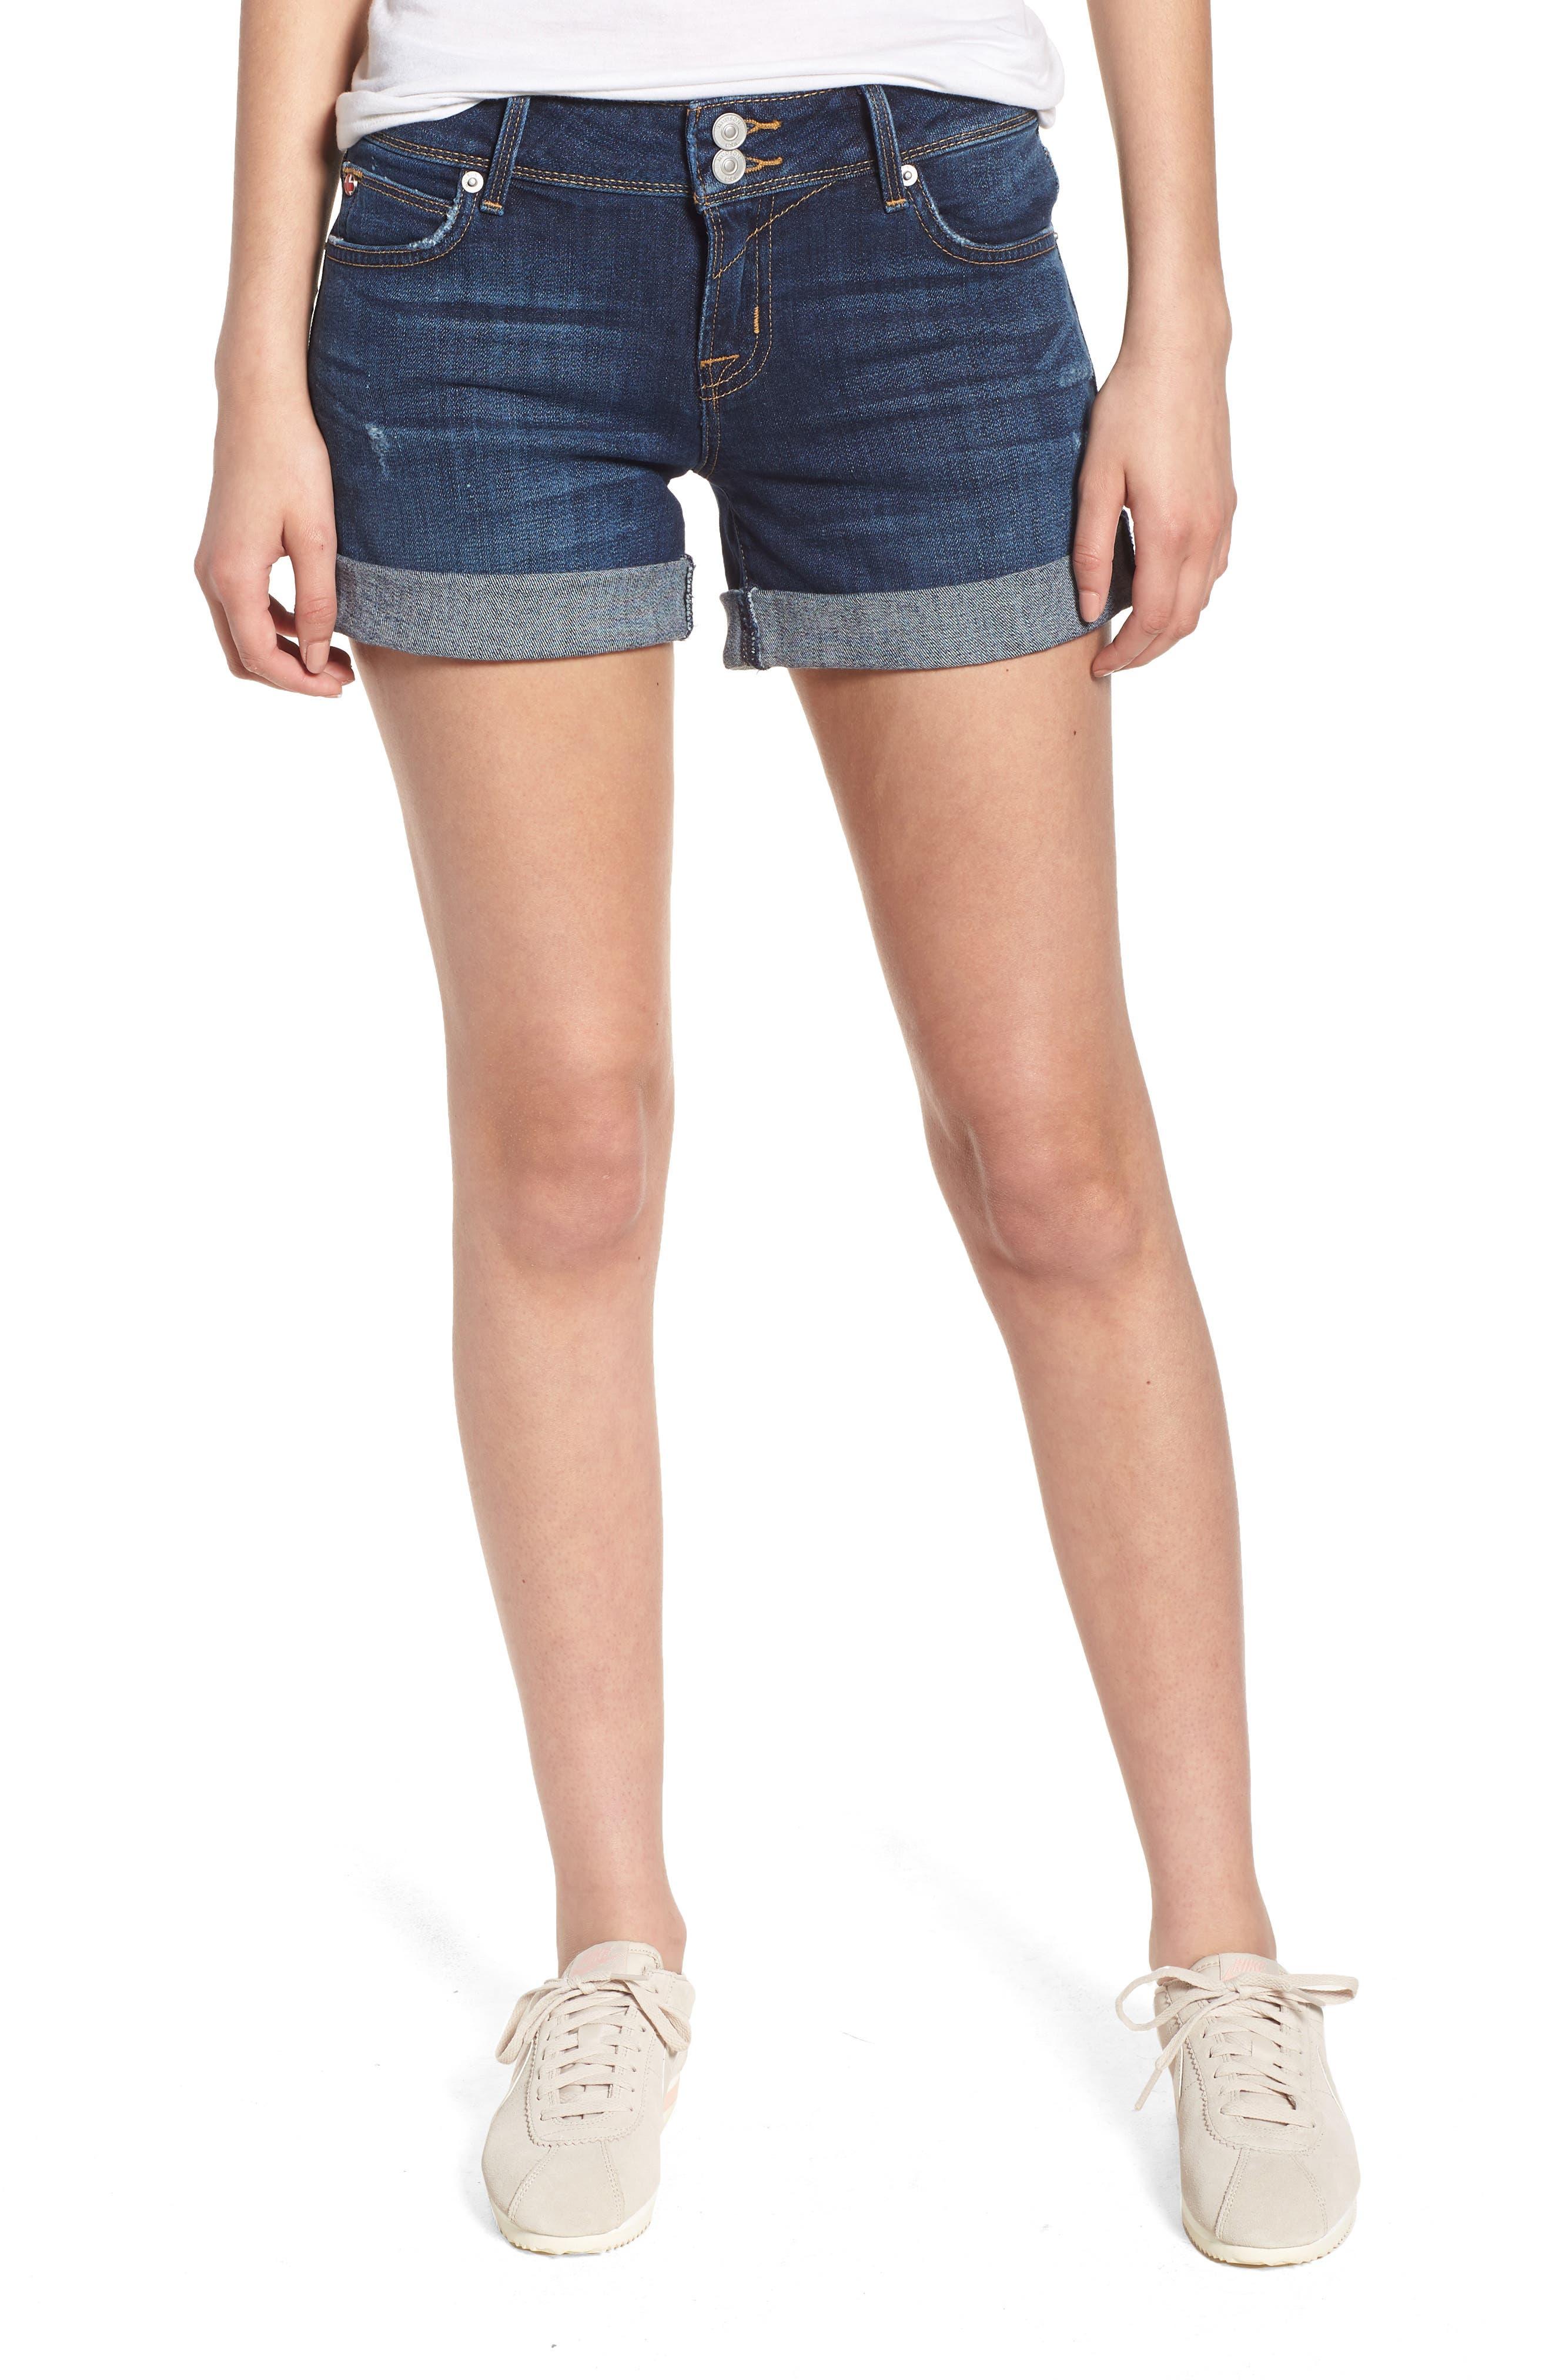 Main Image - Hudson Jeans Croxley Cuffed Denim Shorts (Double-Deal)